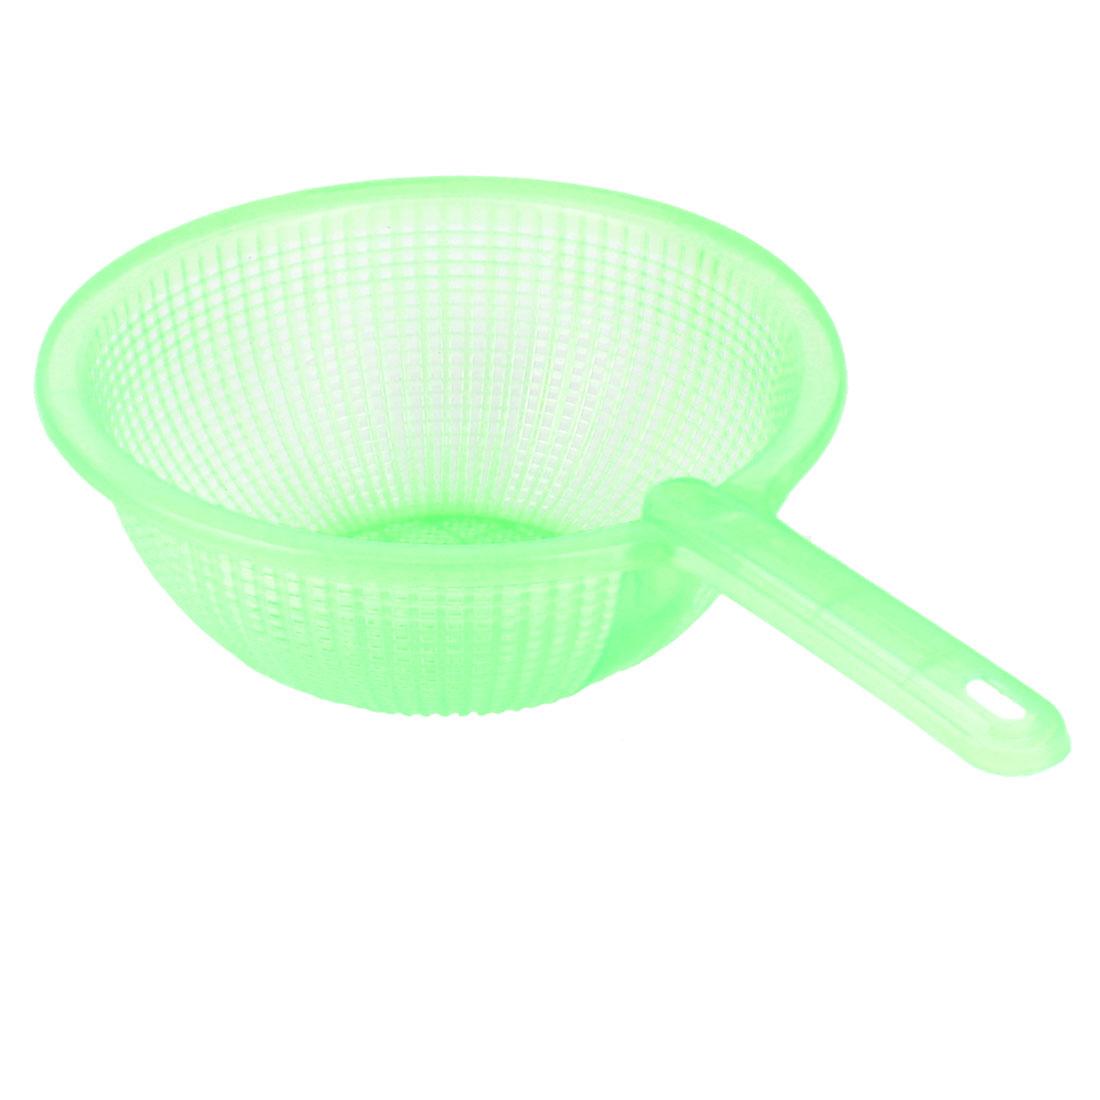 Kitchen Plastic Fruits Vegetables Rice Washing Wash Filter Strainer Colander Green